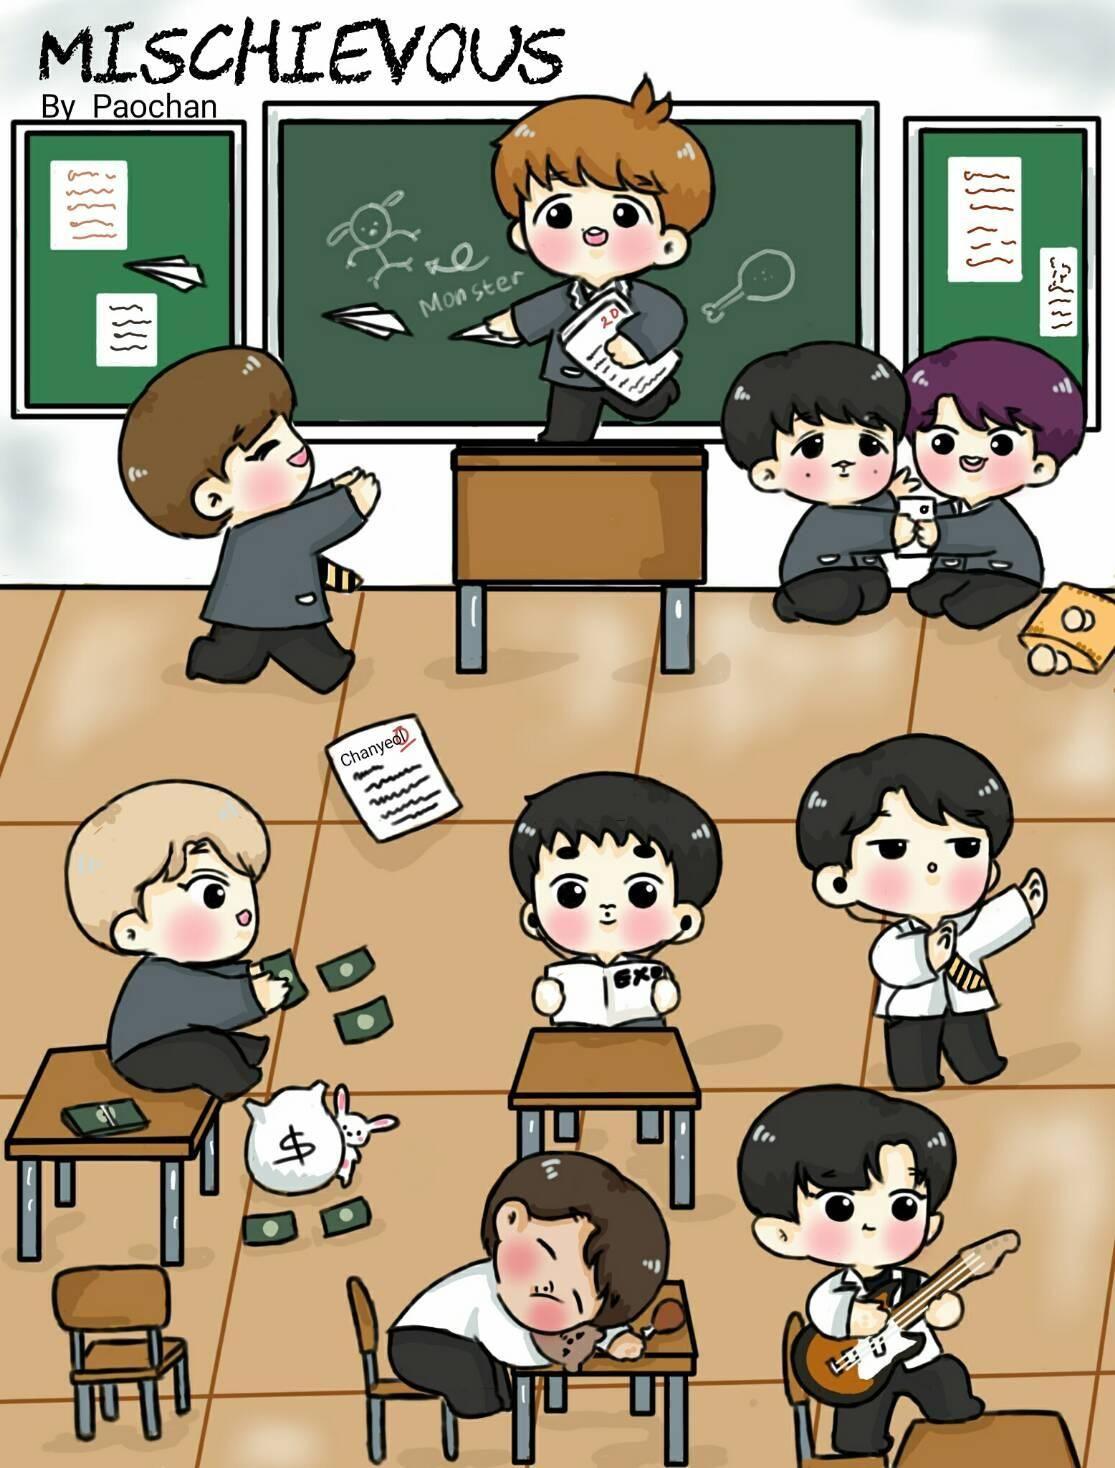 Best Funny Ilustrations  #exo  #chanyeol  #sehun  #kai  #baekhyun  #kyungsoo  #chen  #xiumin  #lay  #suho  #jongdae  #jongin  #minseok  #do  #chibi  #exowebtoon 5